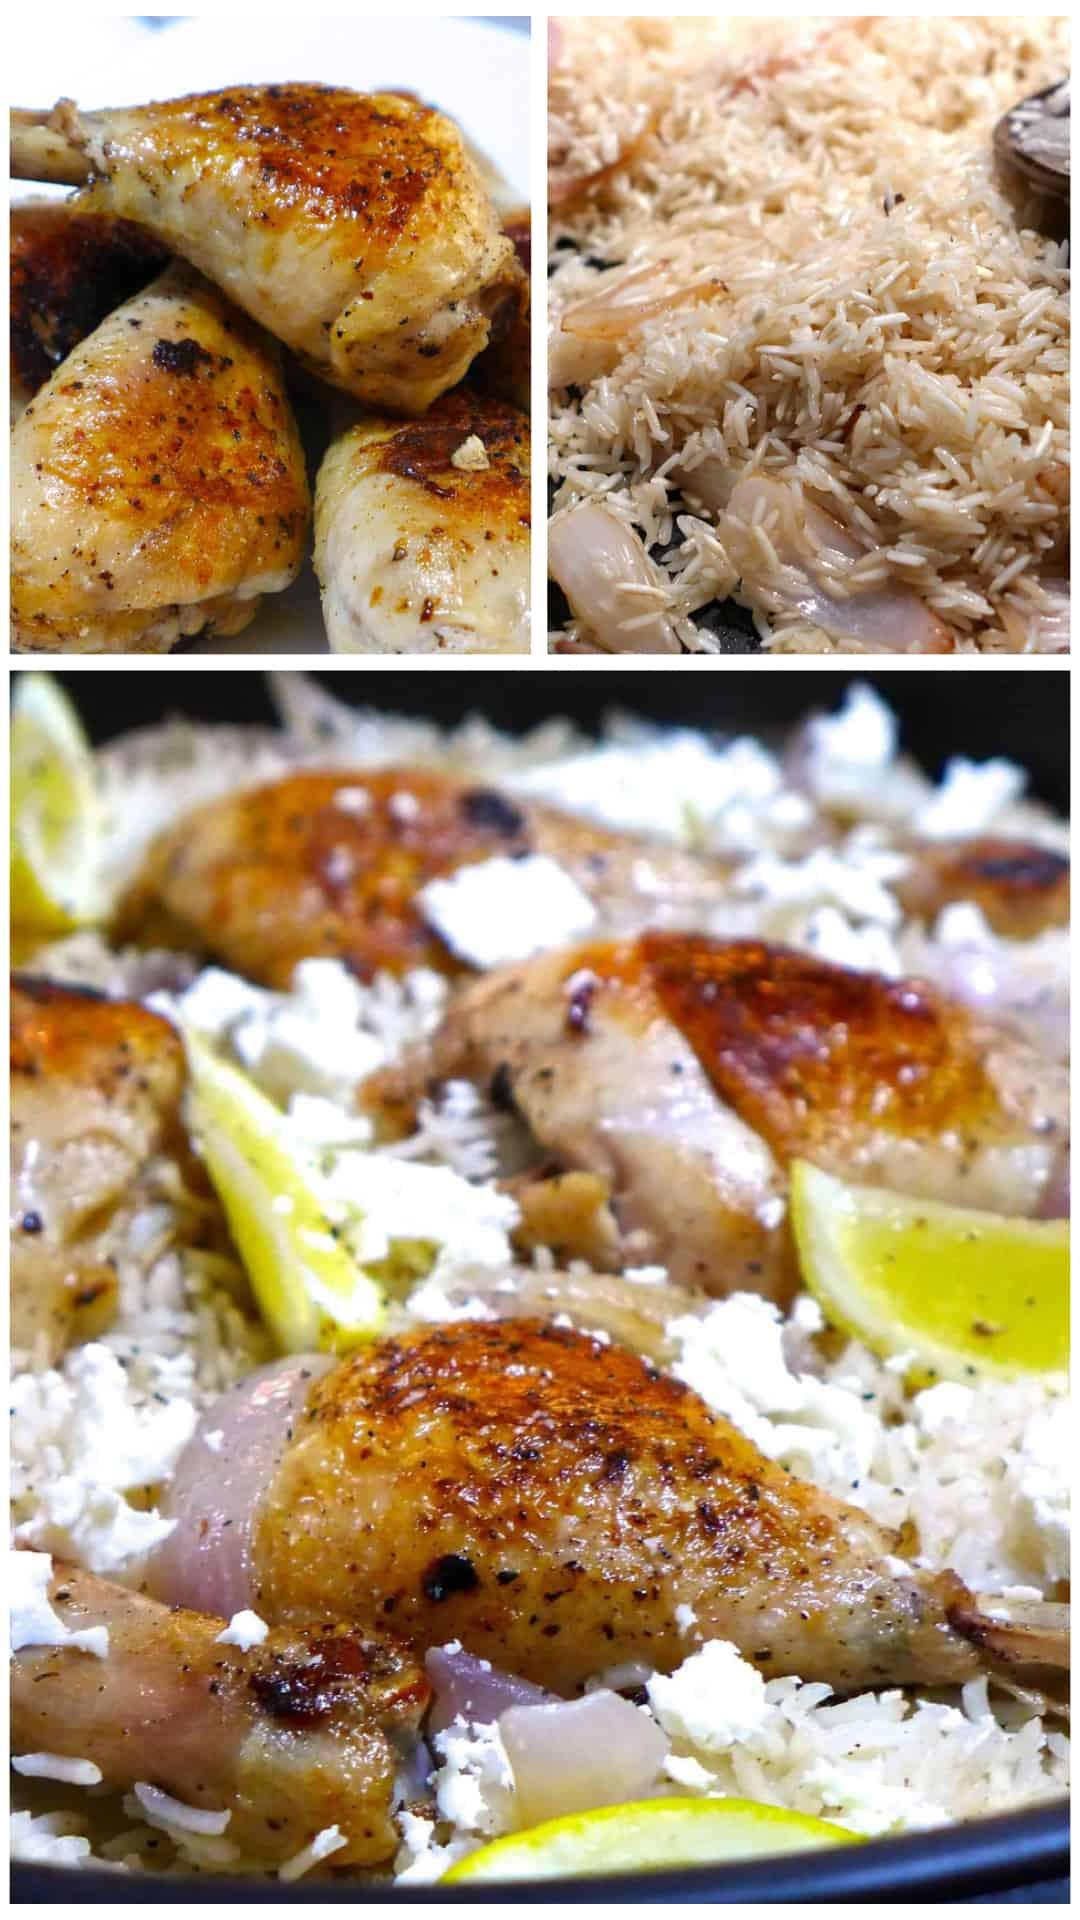 Lemony Greek Rice Pilaf (Pilafi) Recipe with Chicken legs preparation